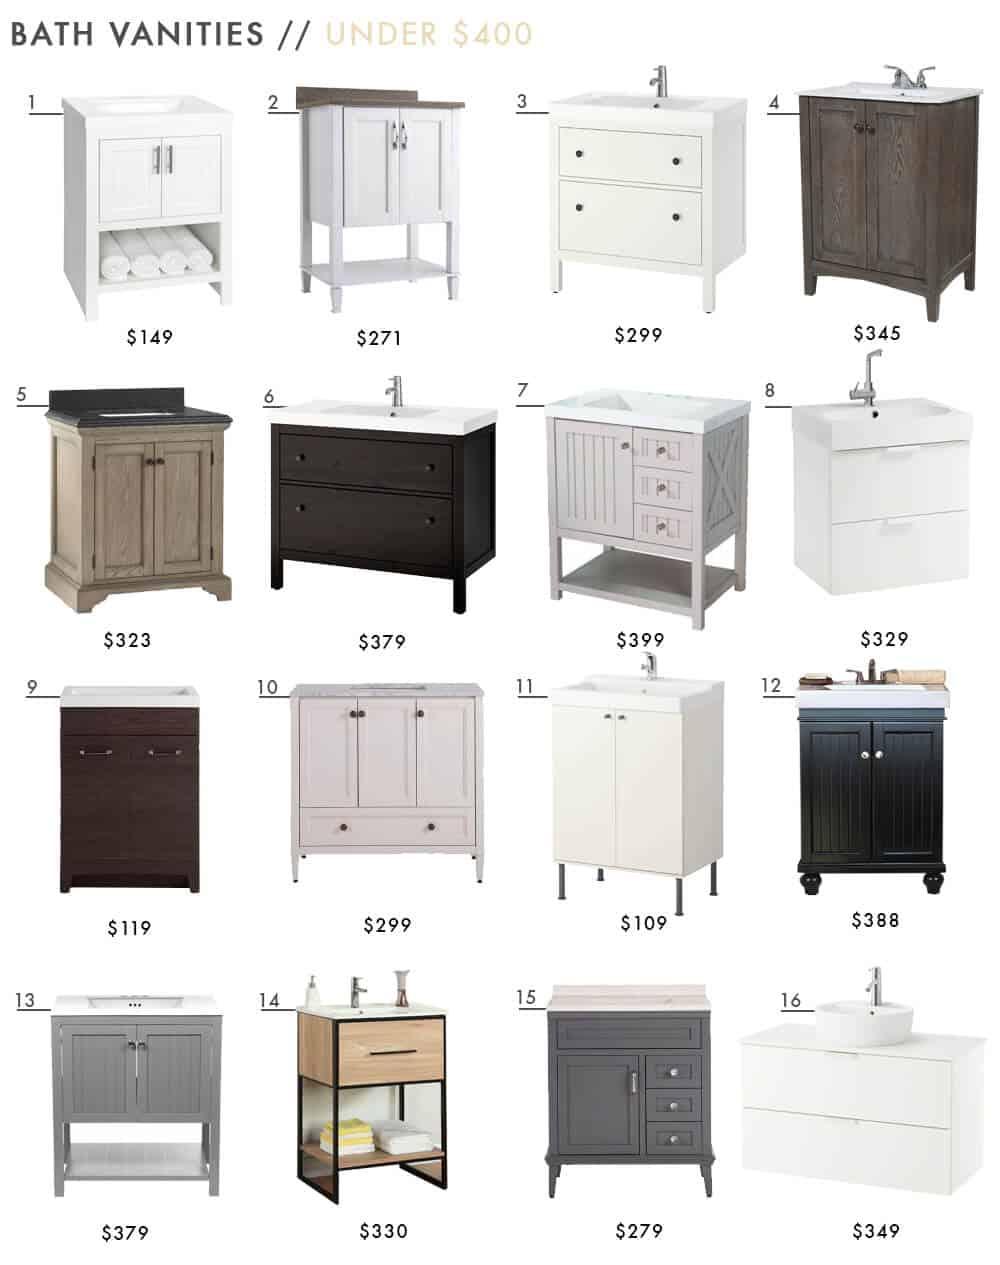 bath-vanities-under-400-roundup-cabinets-sinks-emily-henderson-design